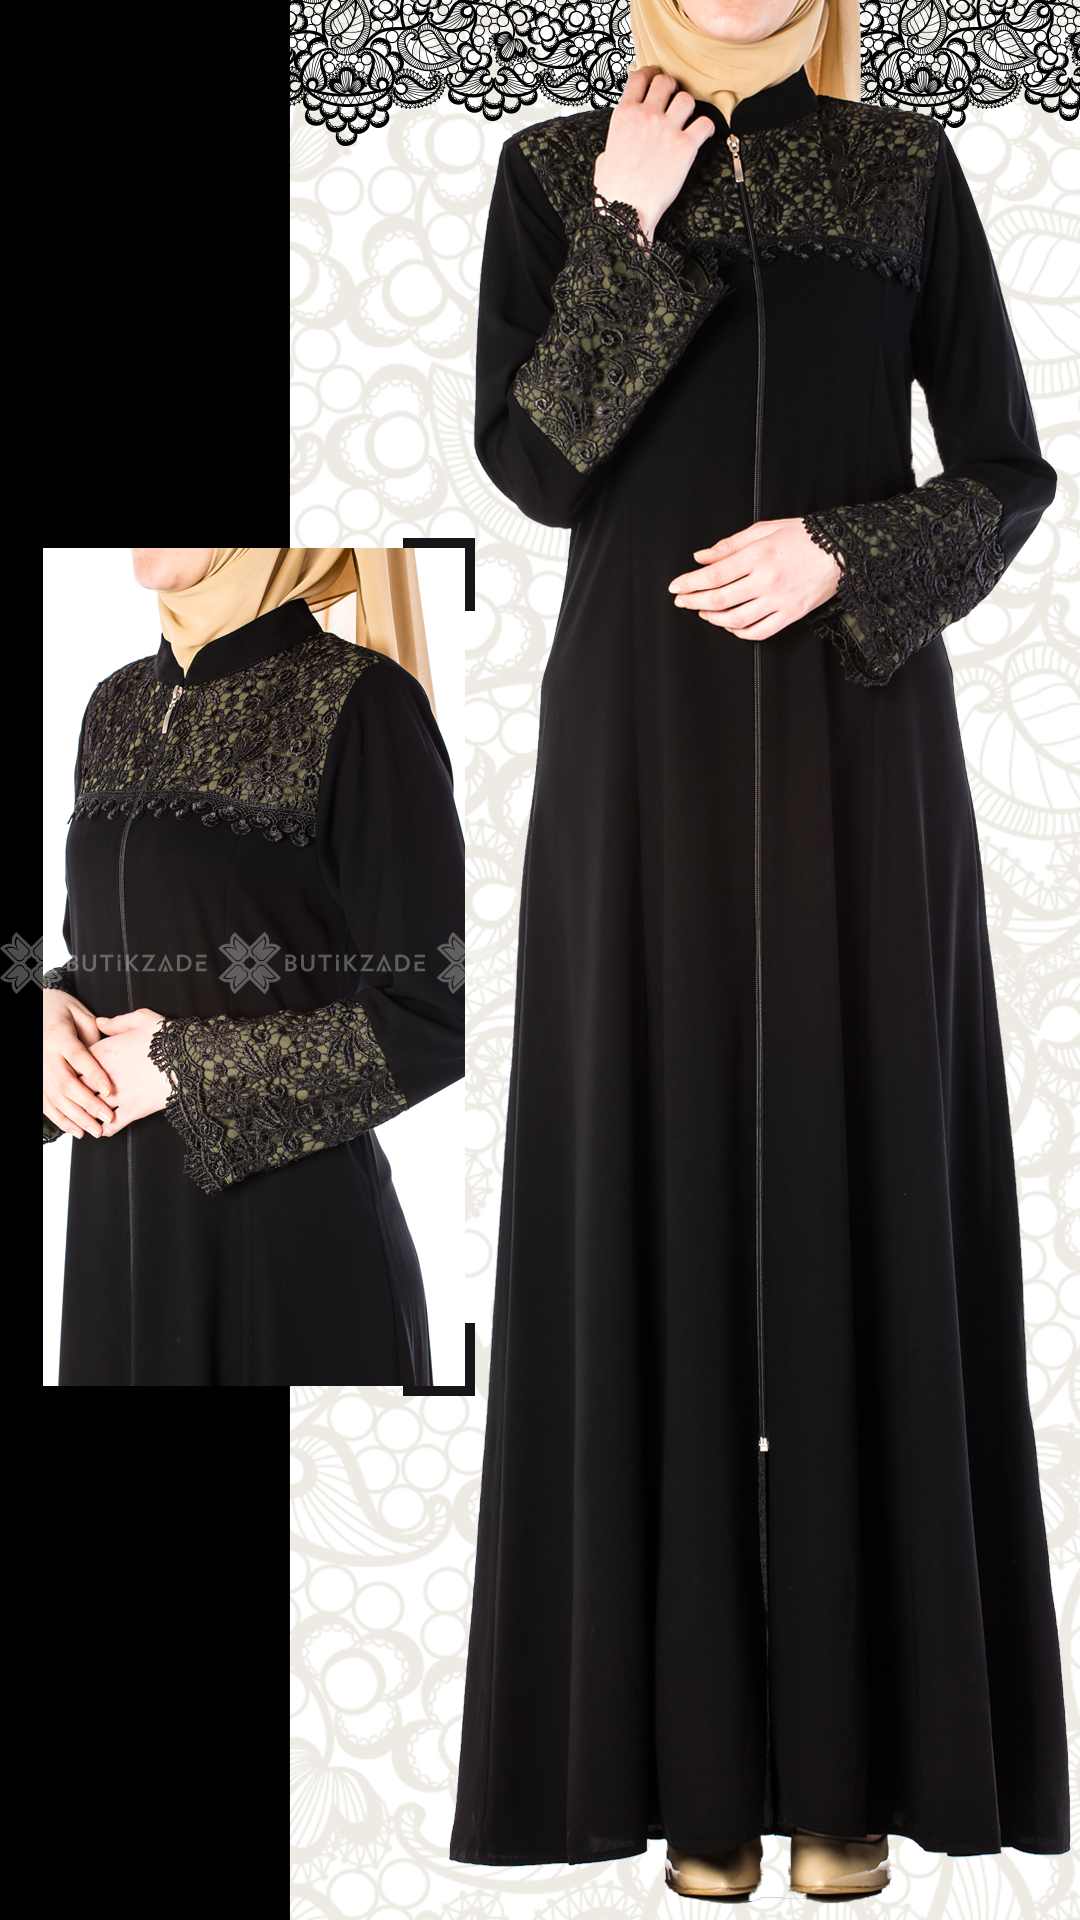 Zumrut Dantelli Ferace Yesil Elbise Islami Giyim Giyim